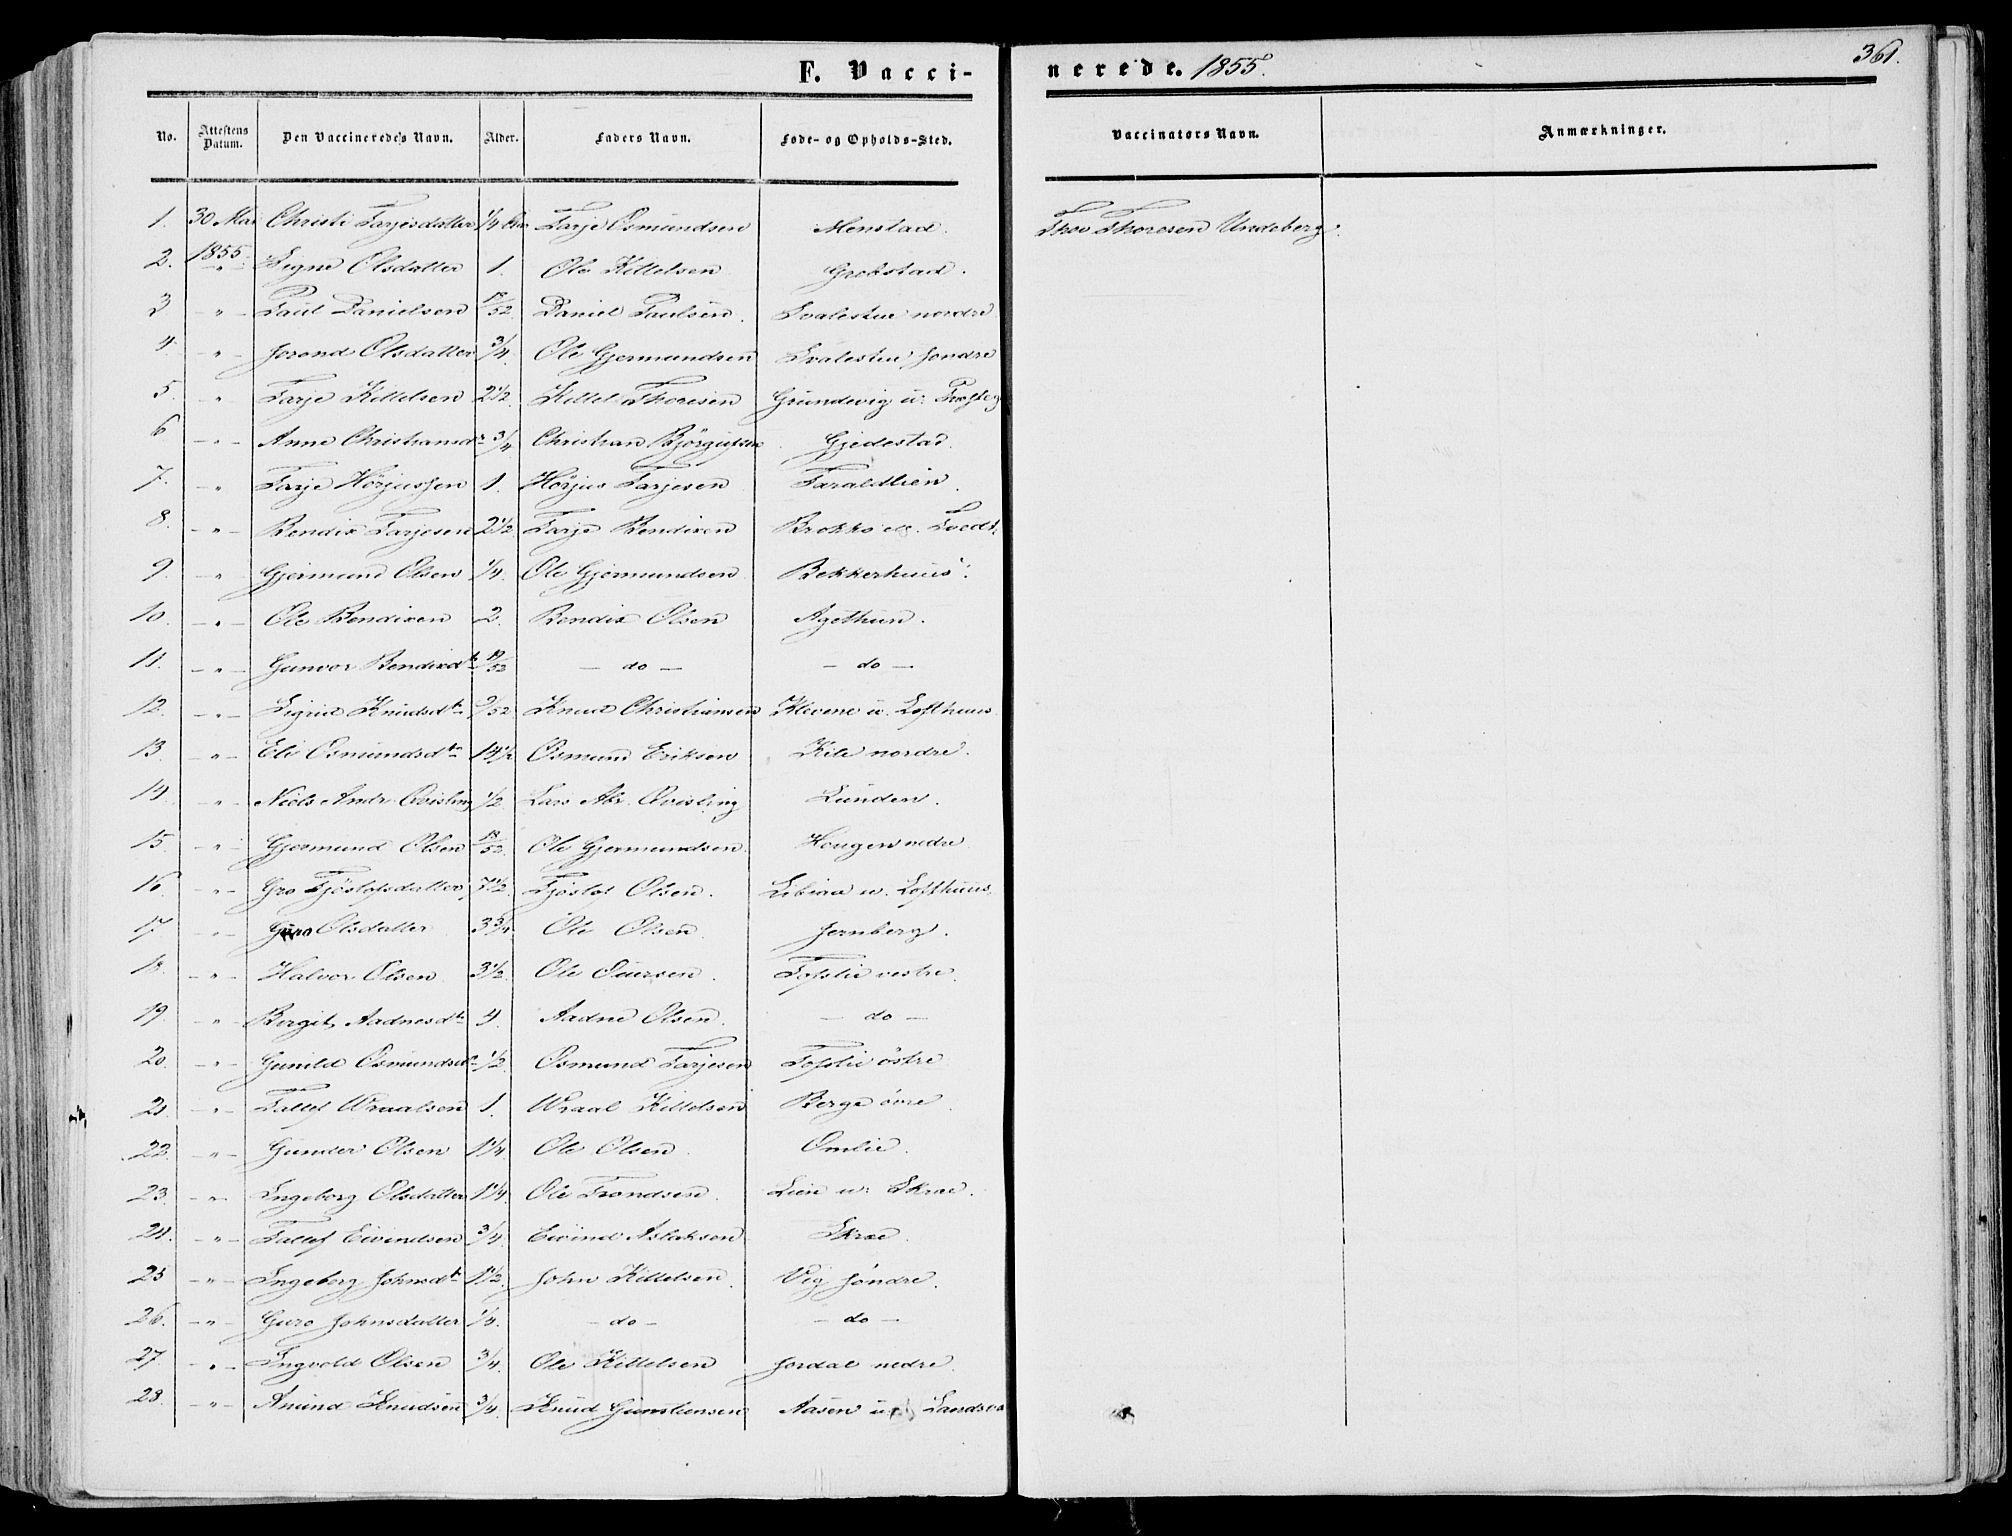 SAKO, Fyresdal kirkebøker, F/Fa/L0005: Parish register (official) no. I 5, 1855-1871, p. 361